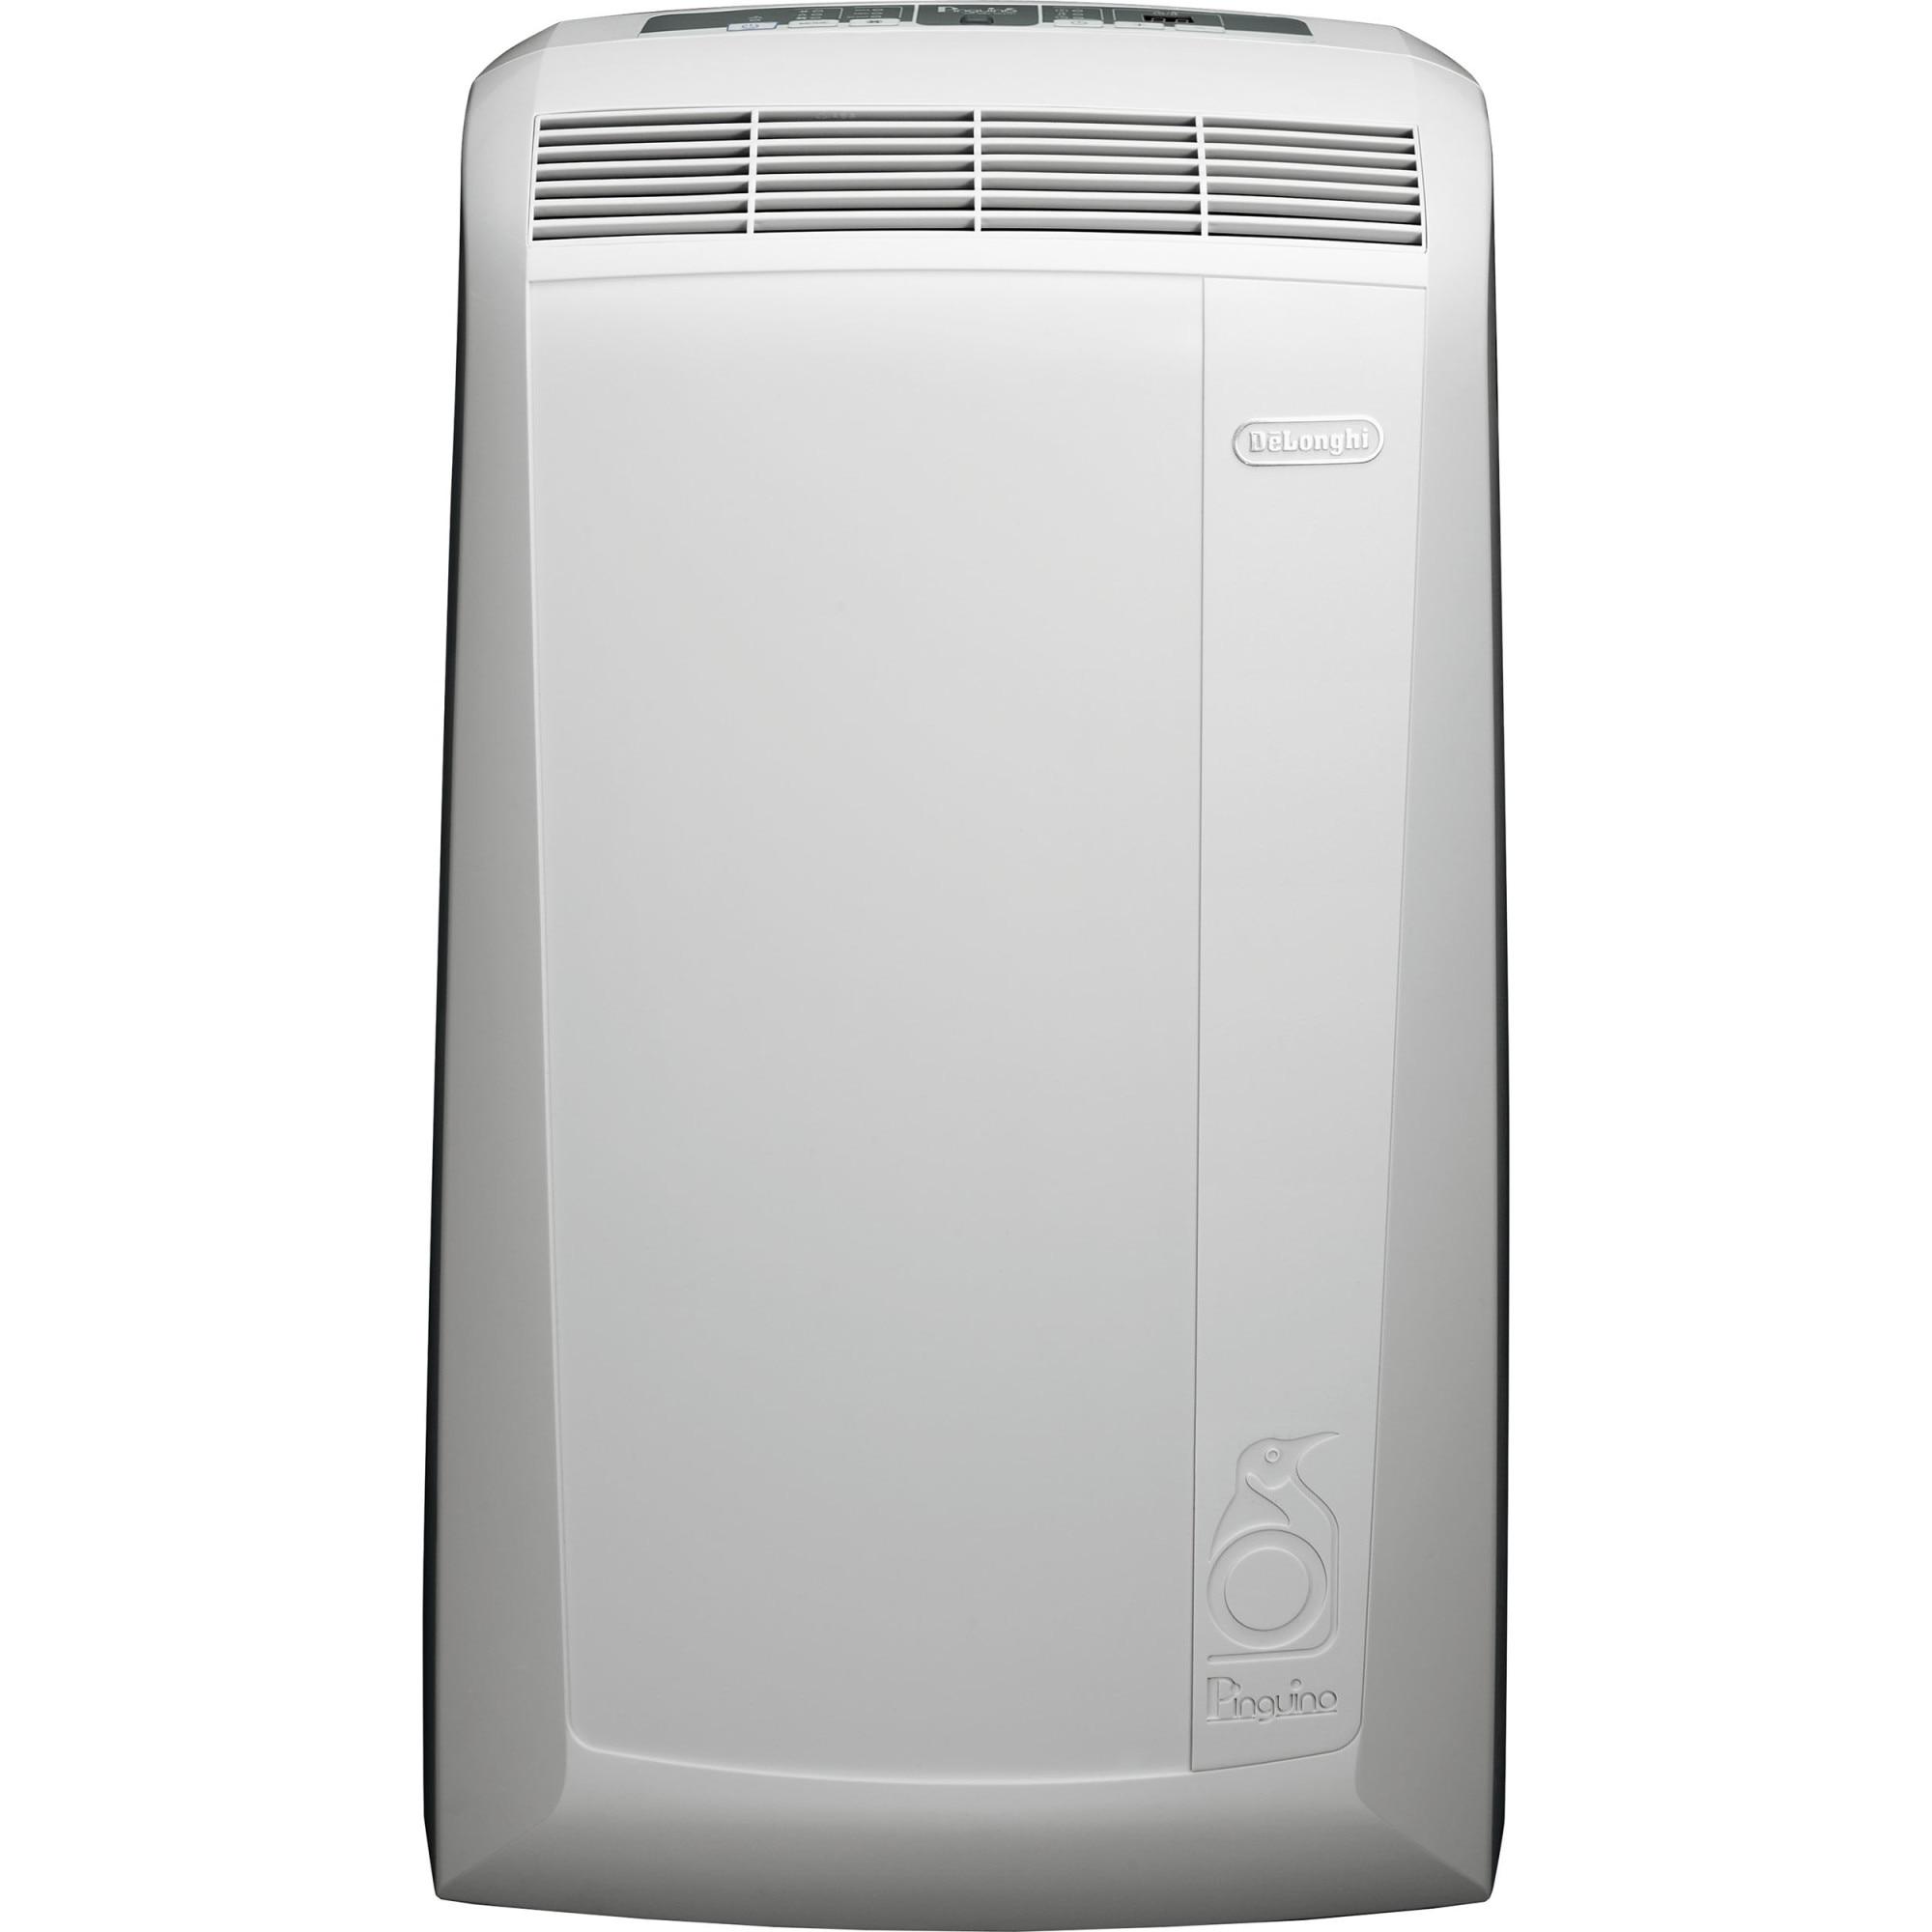 Fotografie Aparat de aer conditionat portabil De'Longhi 9400 BTU, Clasa A, dezumidificare, functie ventilare, timer, control digital, PAC N82 ECO, Alb